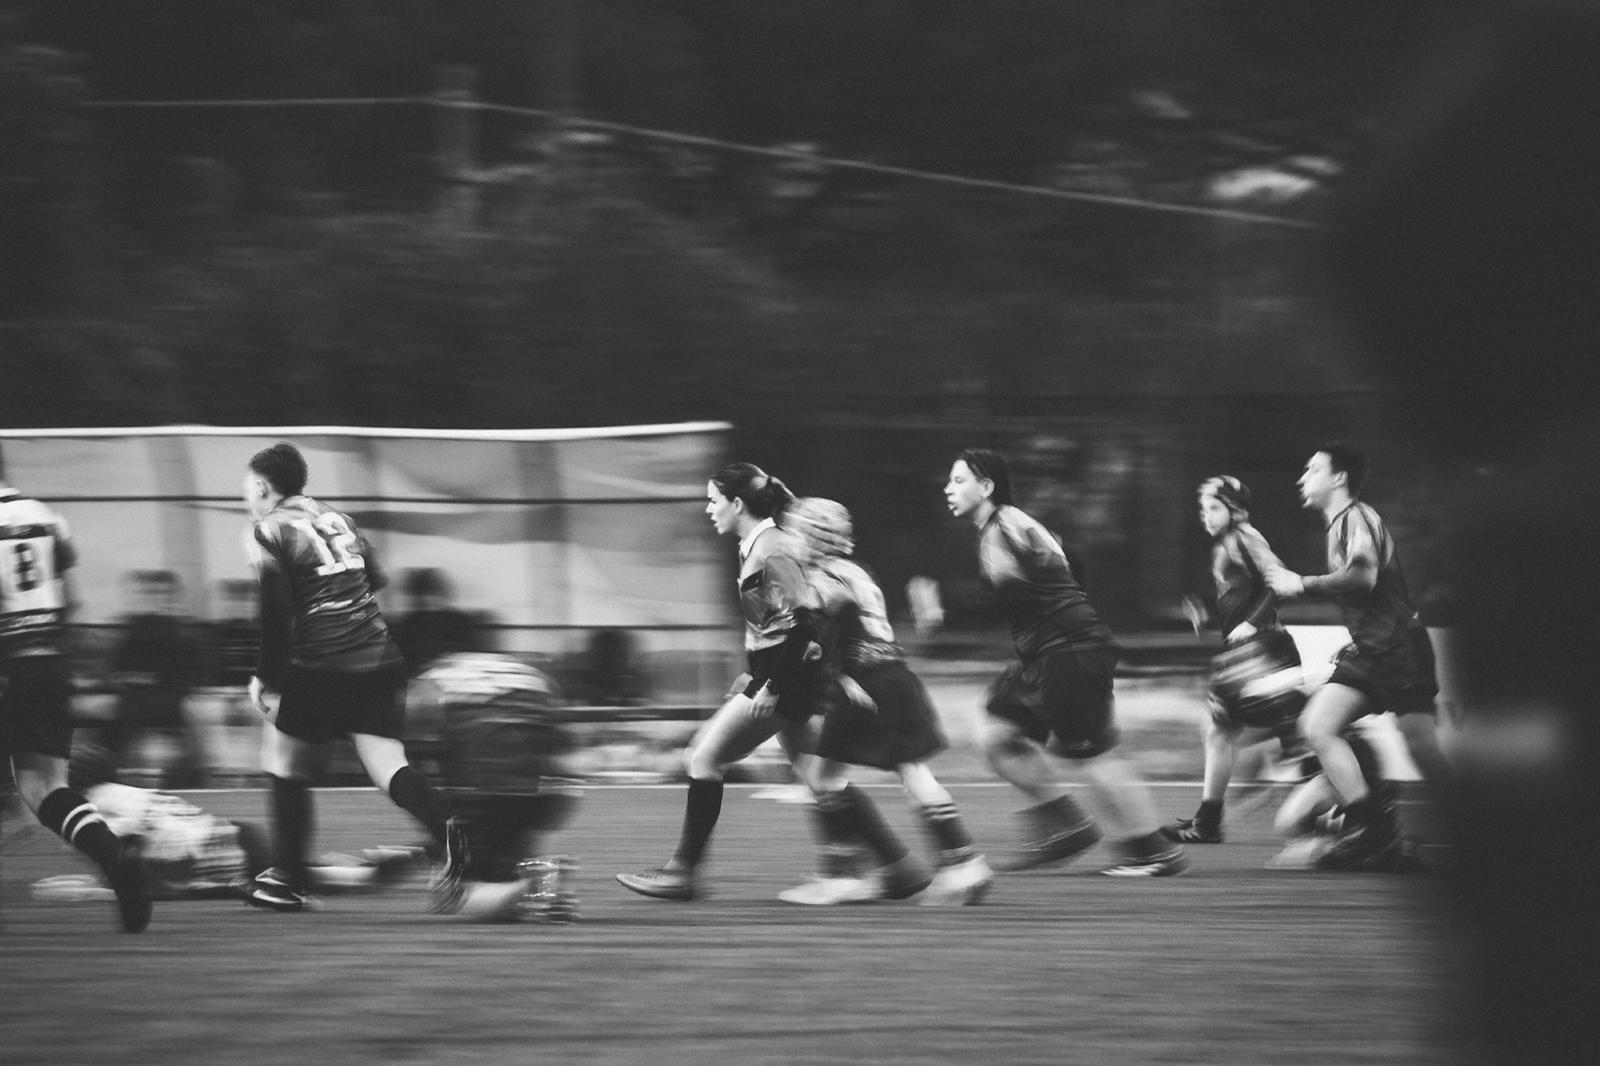 U14 maschile: Amatori Napoli Rugby vs Unione Rugby Capitolina